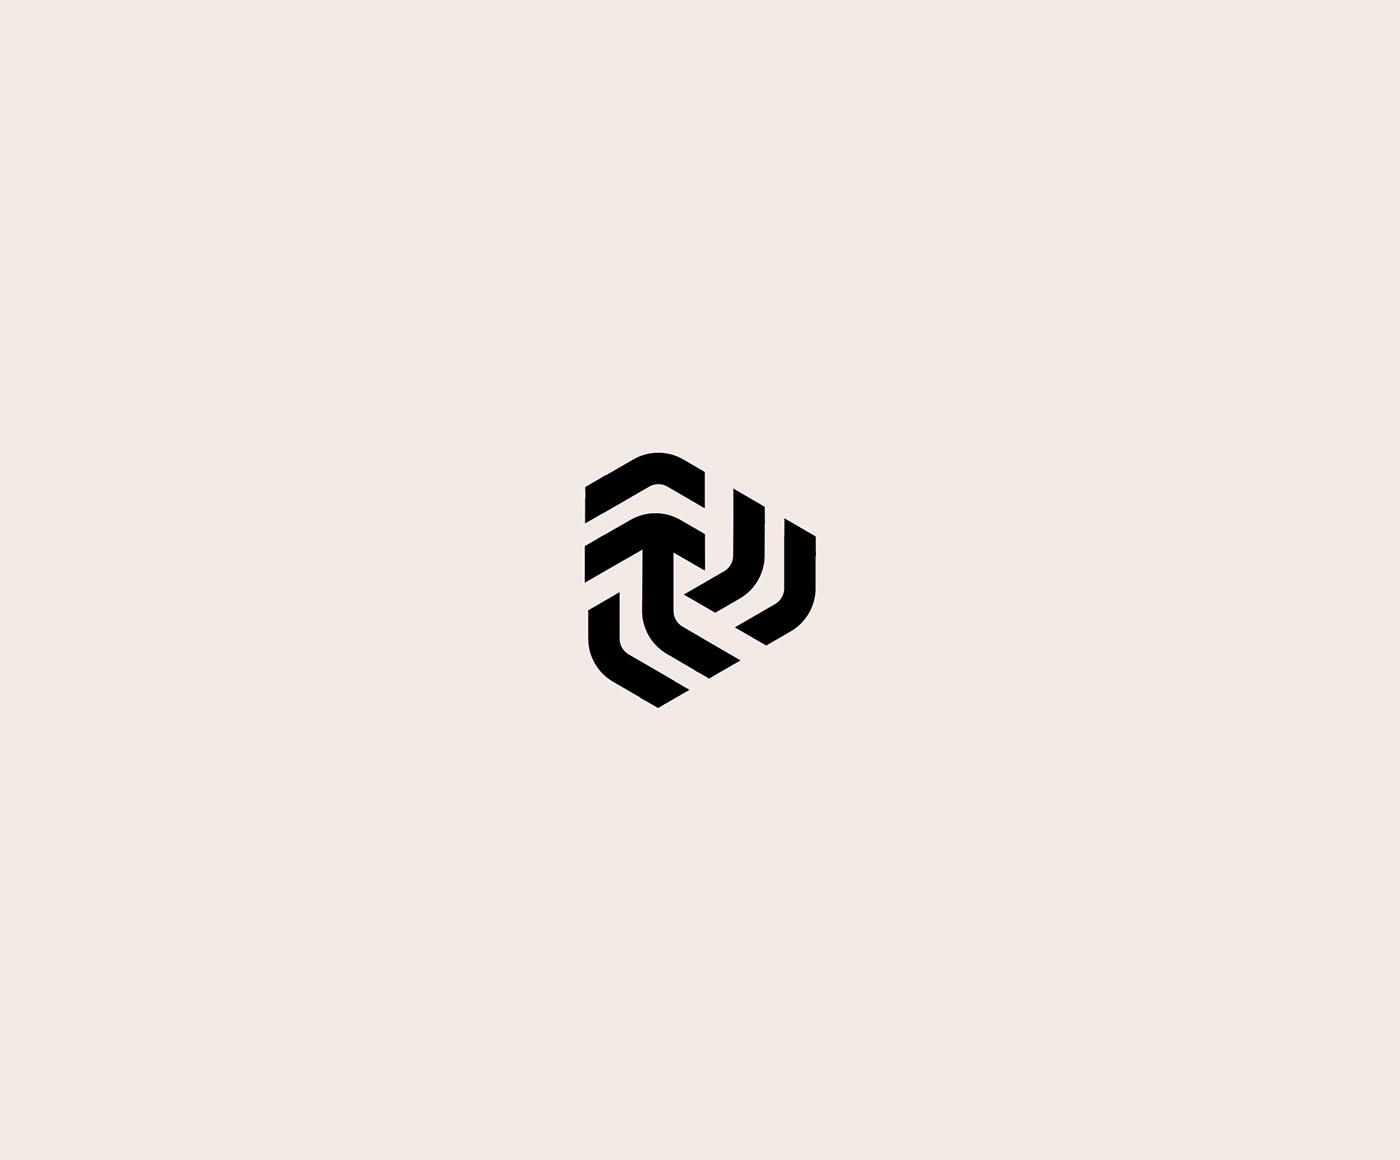 branding  Icon logo logo collection Logo Design logo mark logofolio logos marks symbols